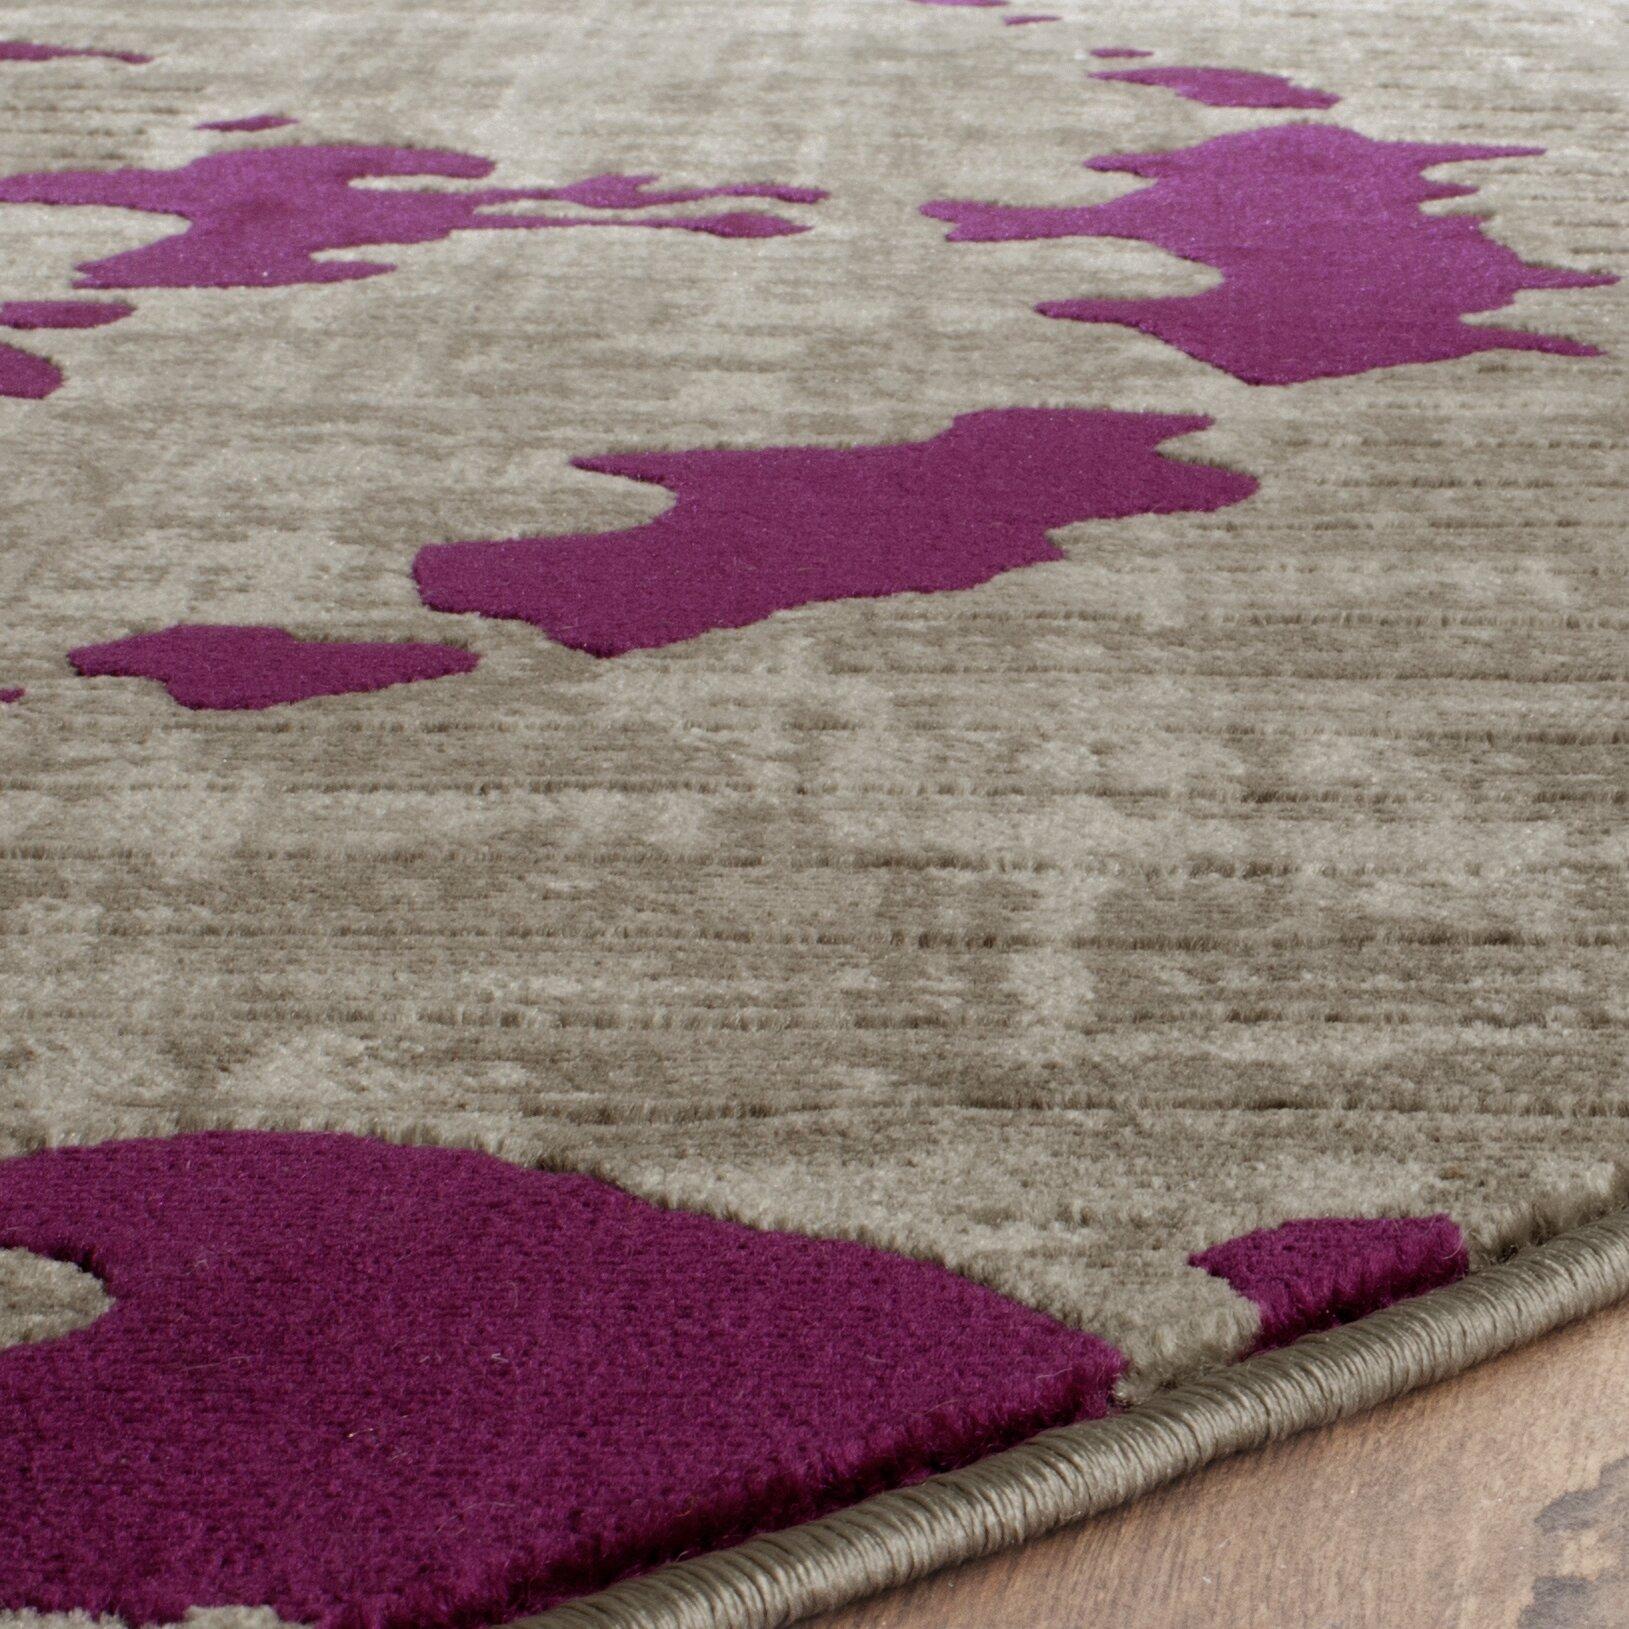 Purple And Gray Area Rugs: World Menagerie Varnai Light Gray/Purple Area Rug